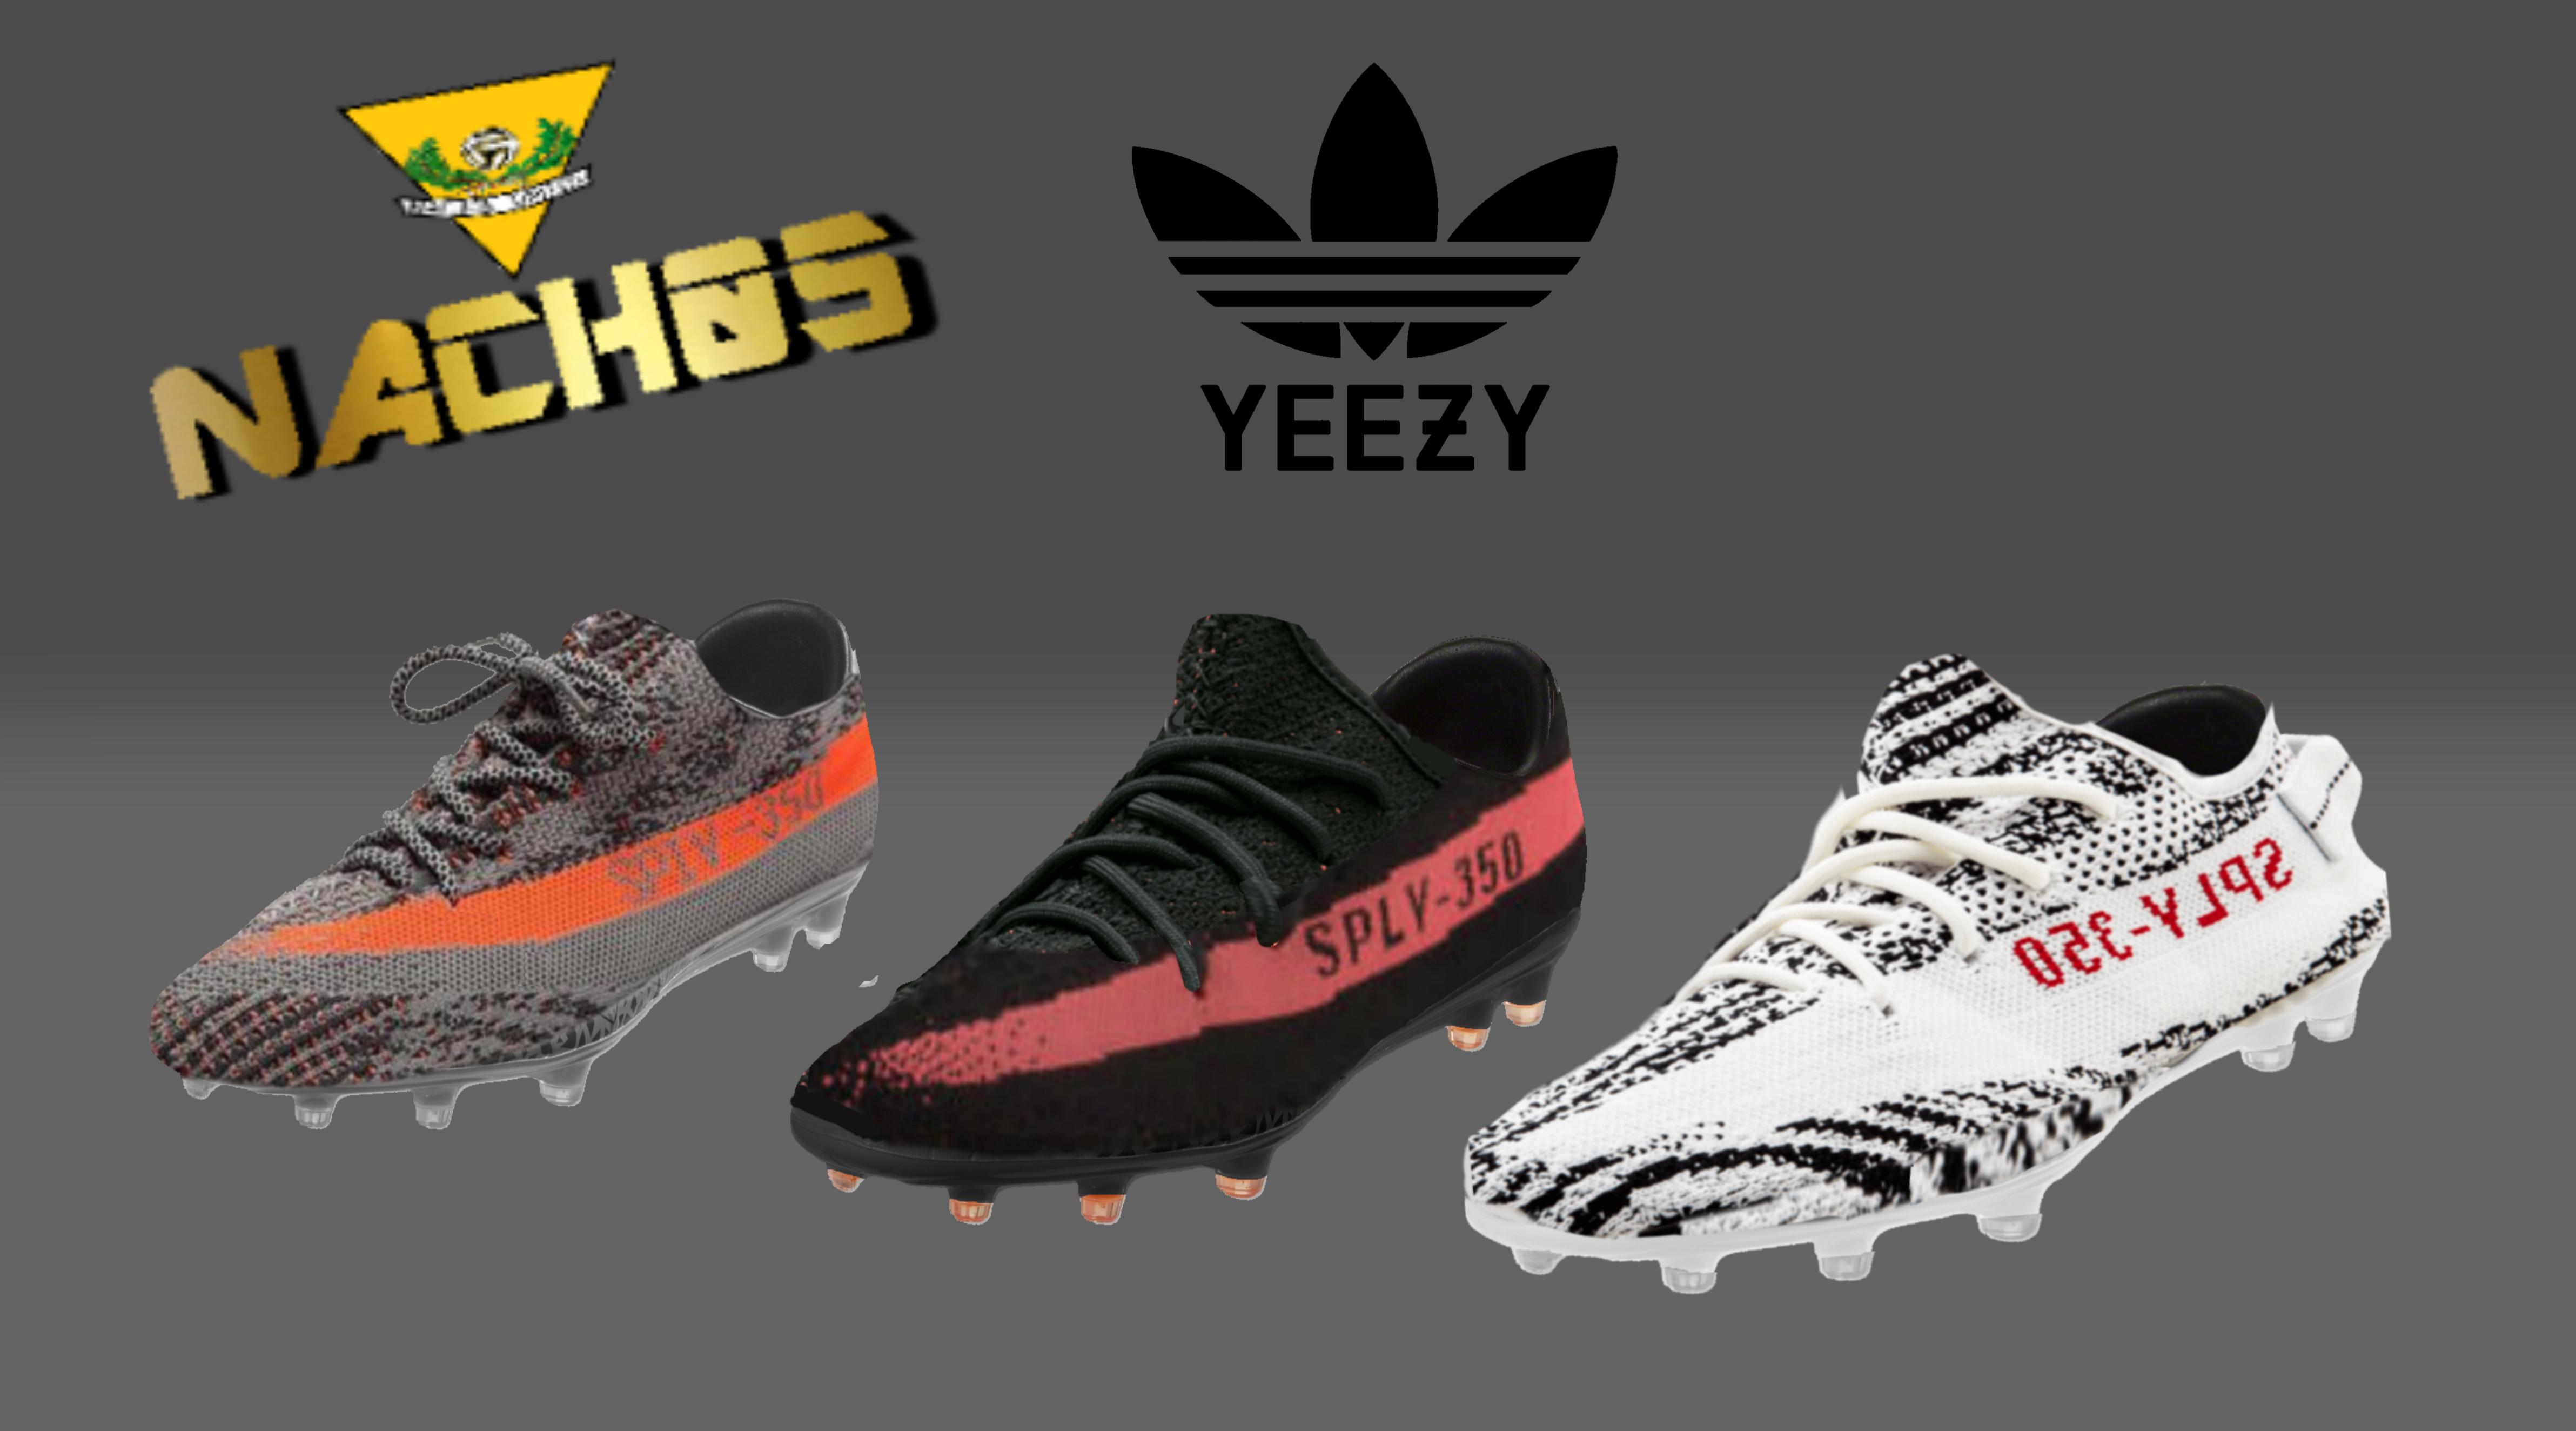 449c67c2159 Adidas Yeezy 350 V2 Football Boots by NACH05